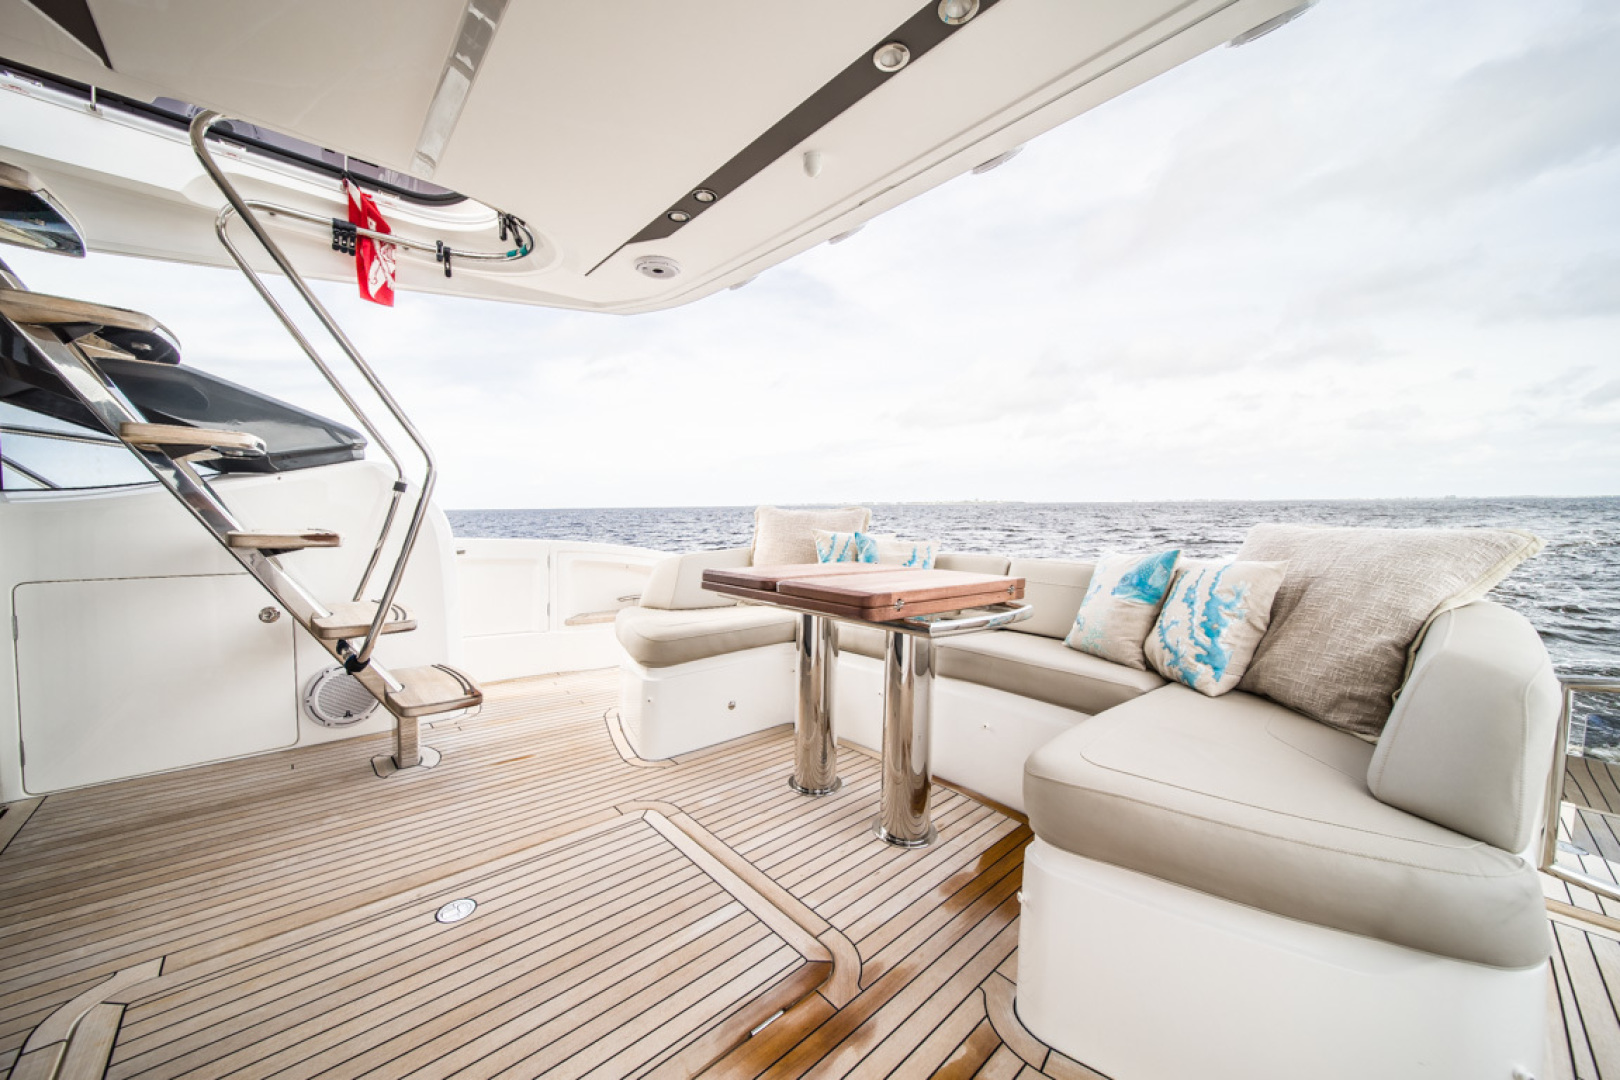 Princess-S65 2019-Paragon Cape Coral-Florida-United States-2019 65 Princess S65-Paragon-Cockpit-1510253 | Thumbnail